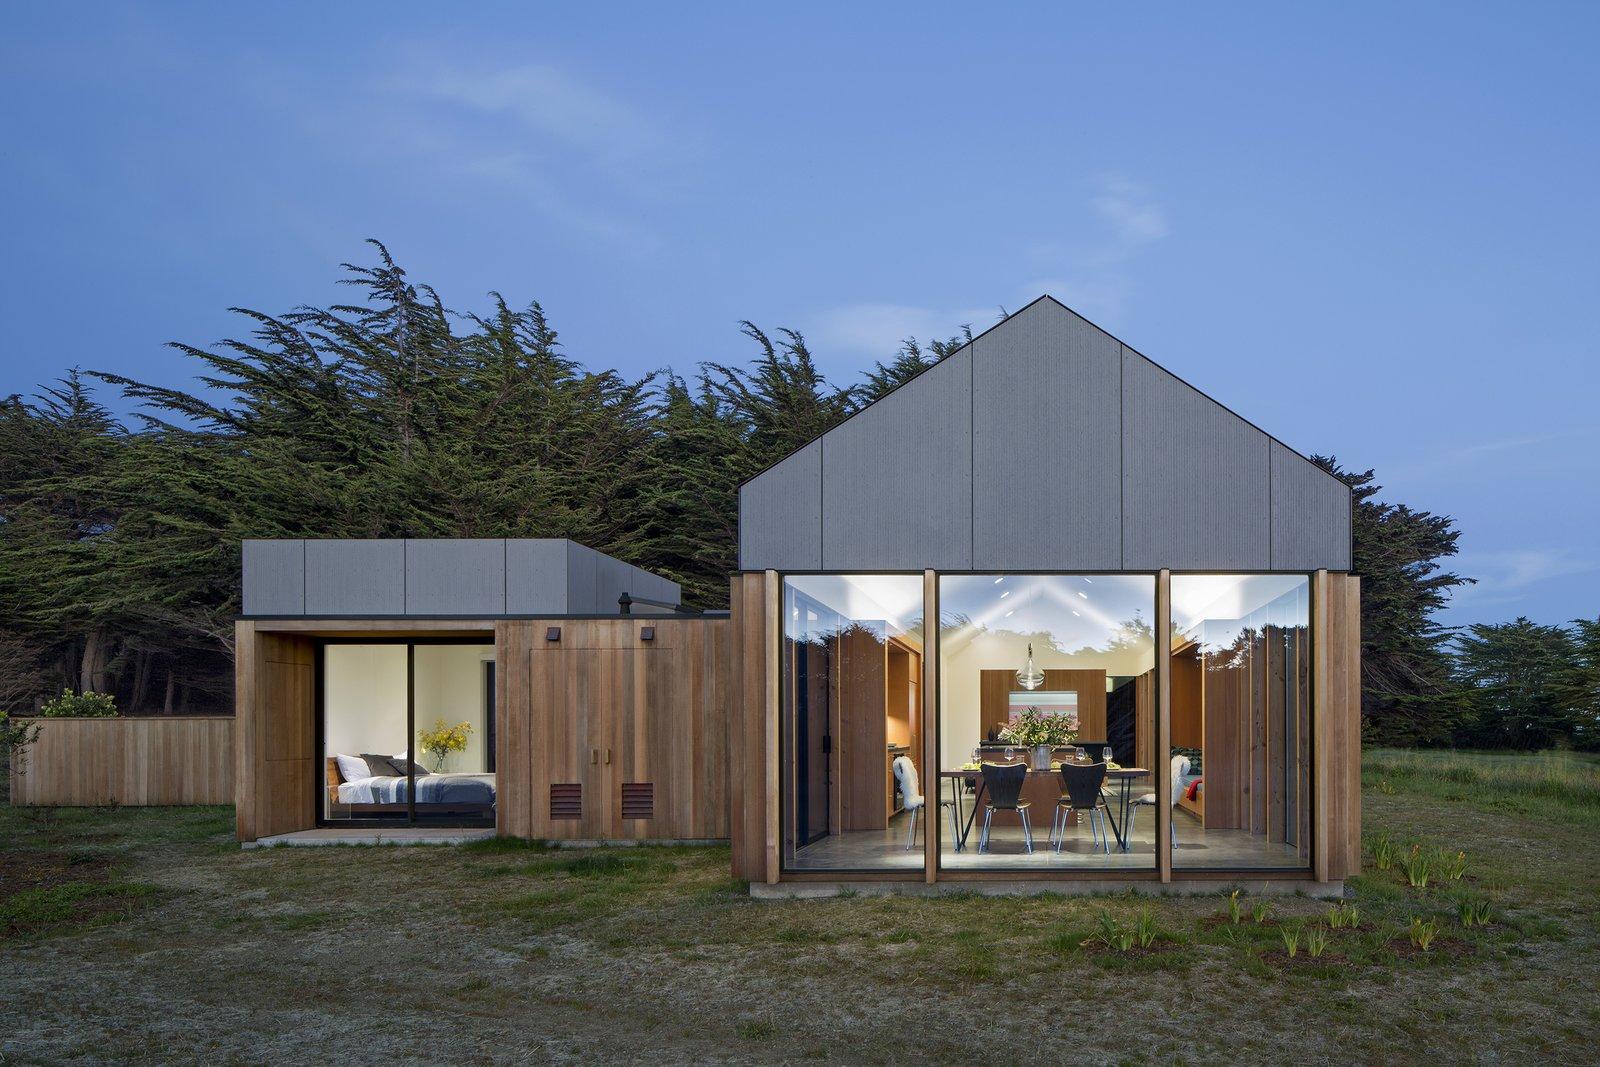 Skyfall Residence by Turnbull Griffin Haesloop